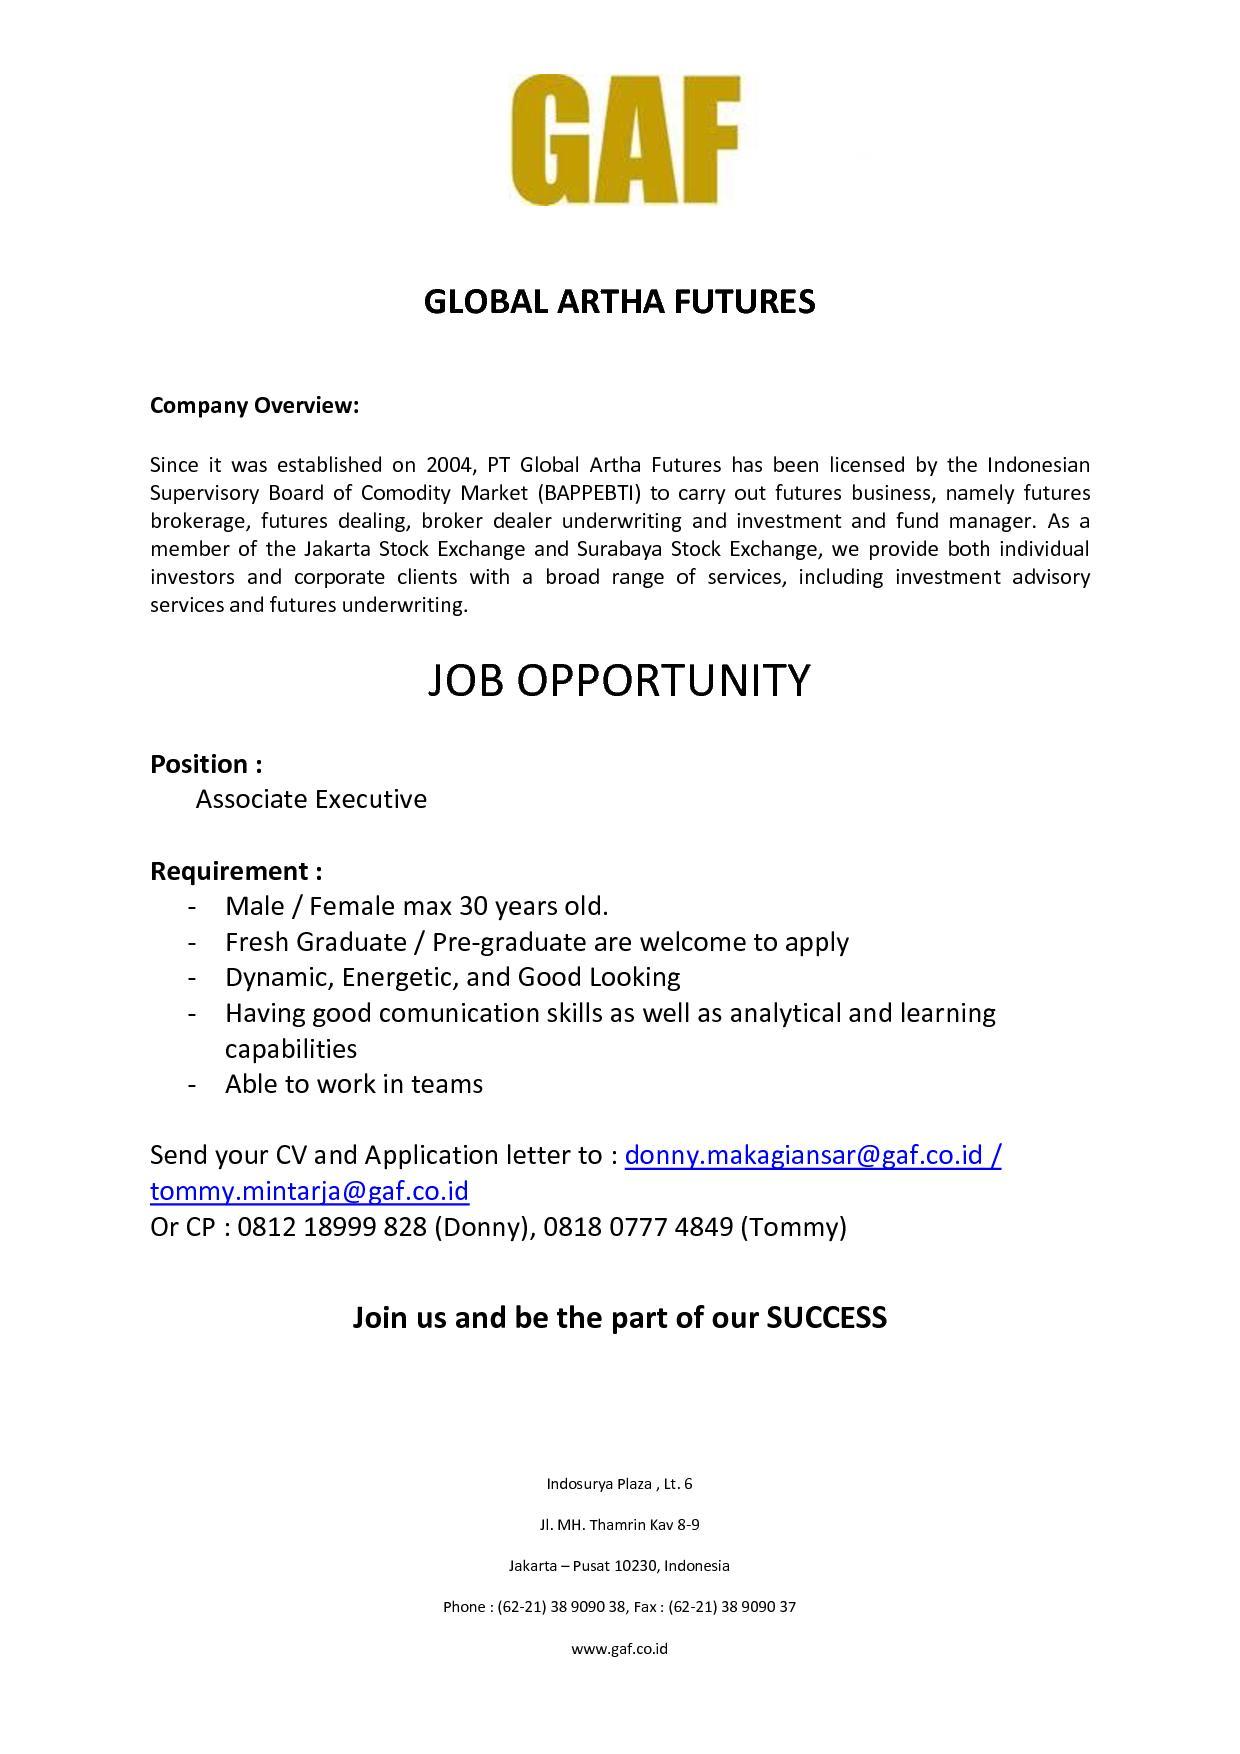 Global Artha Futures